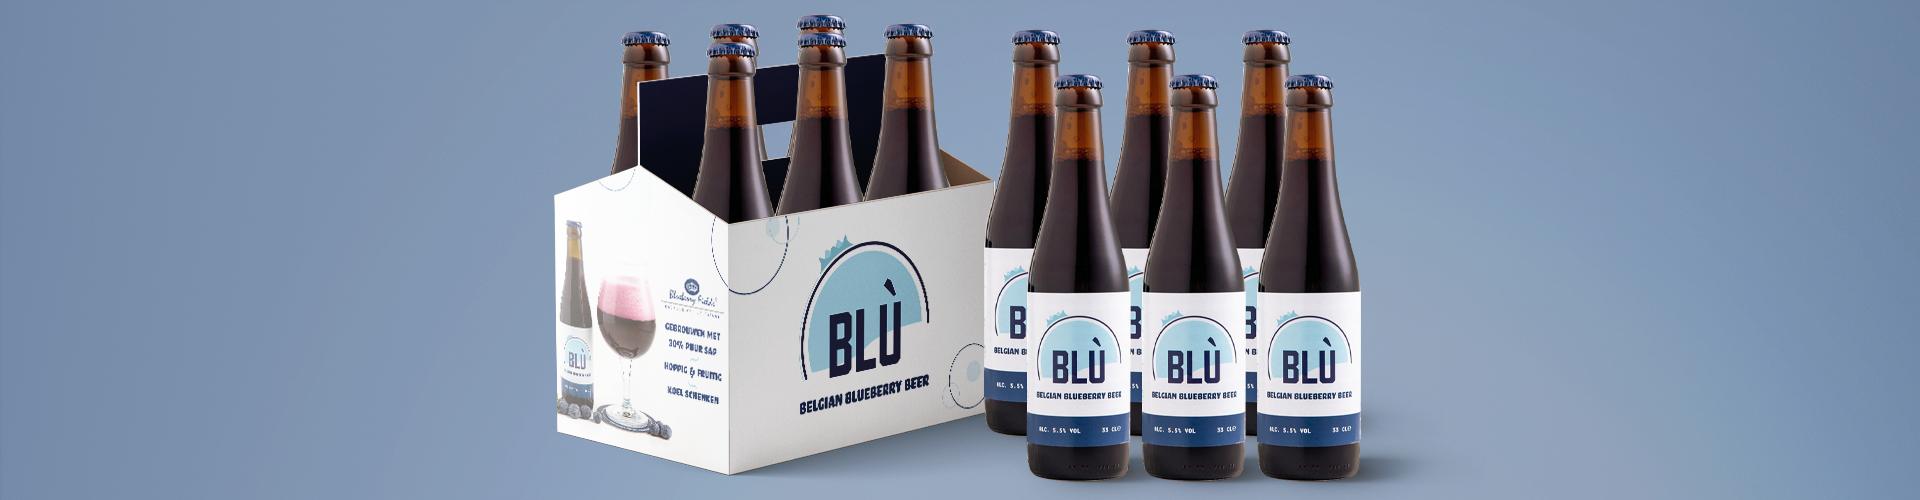 Blù Bier box 12